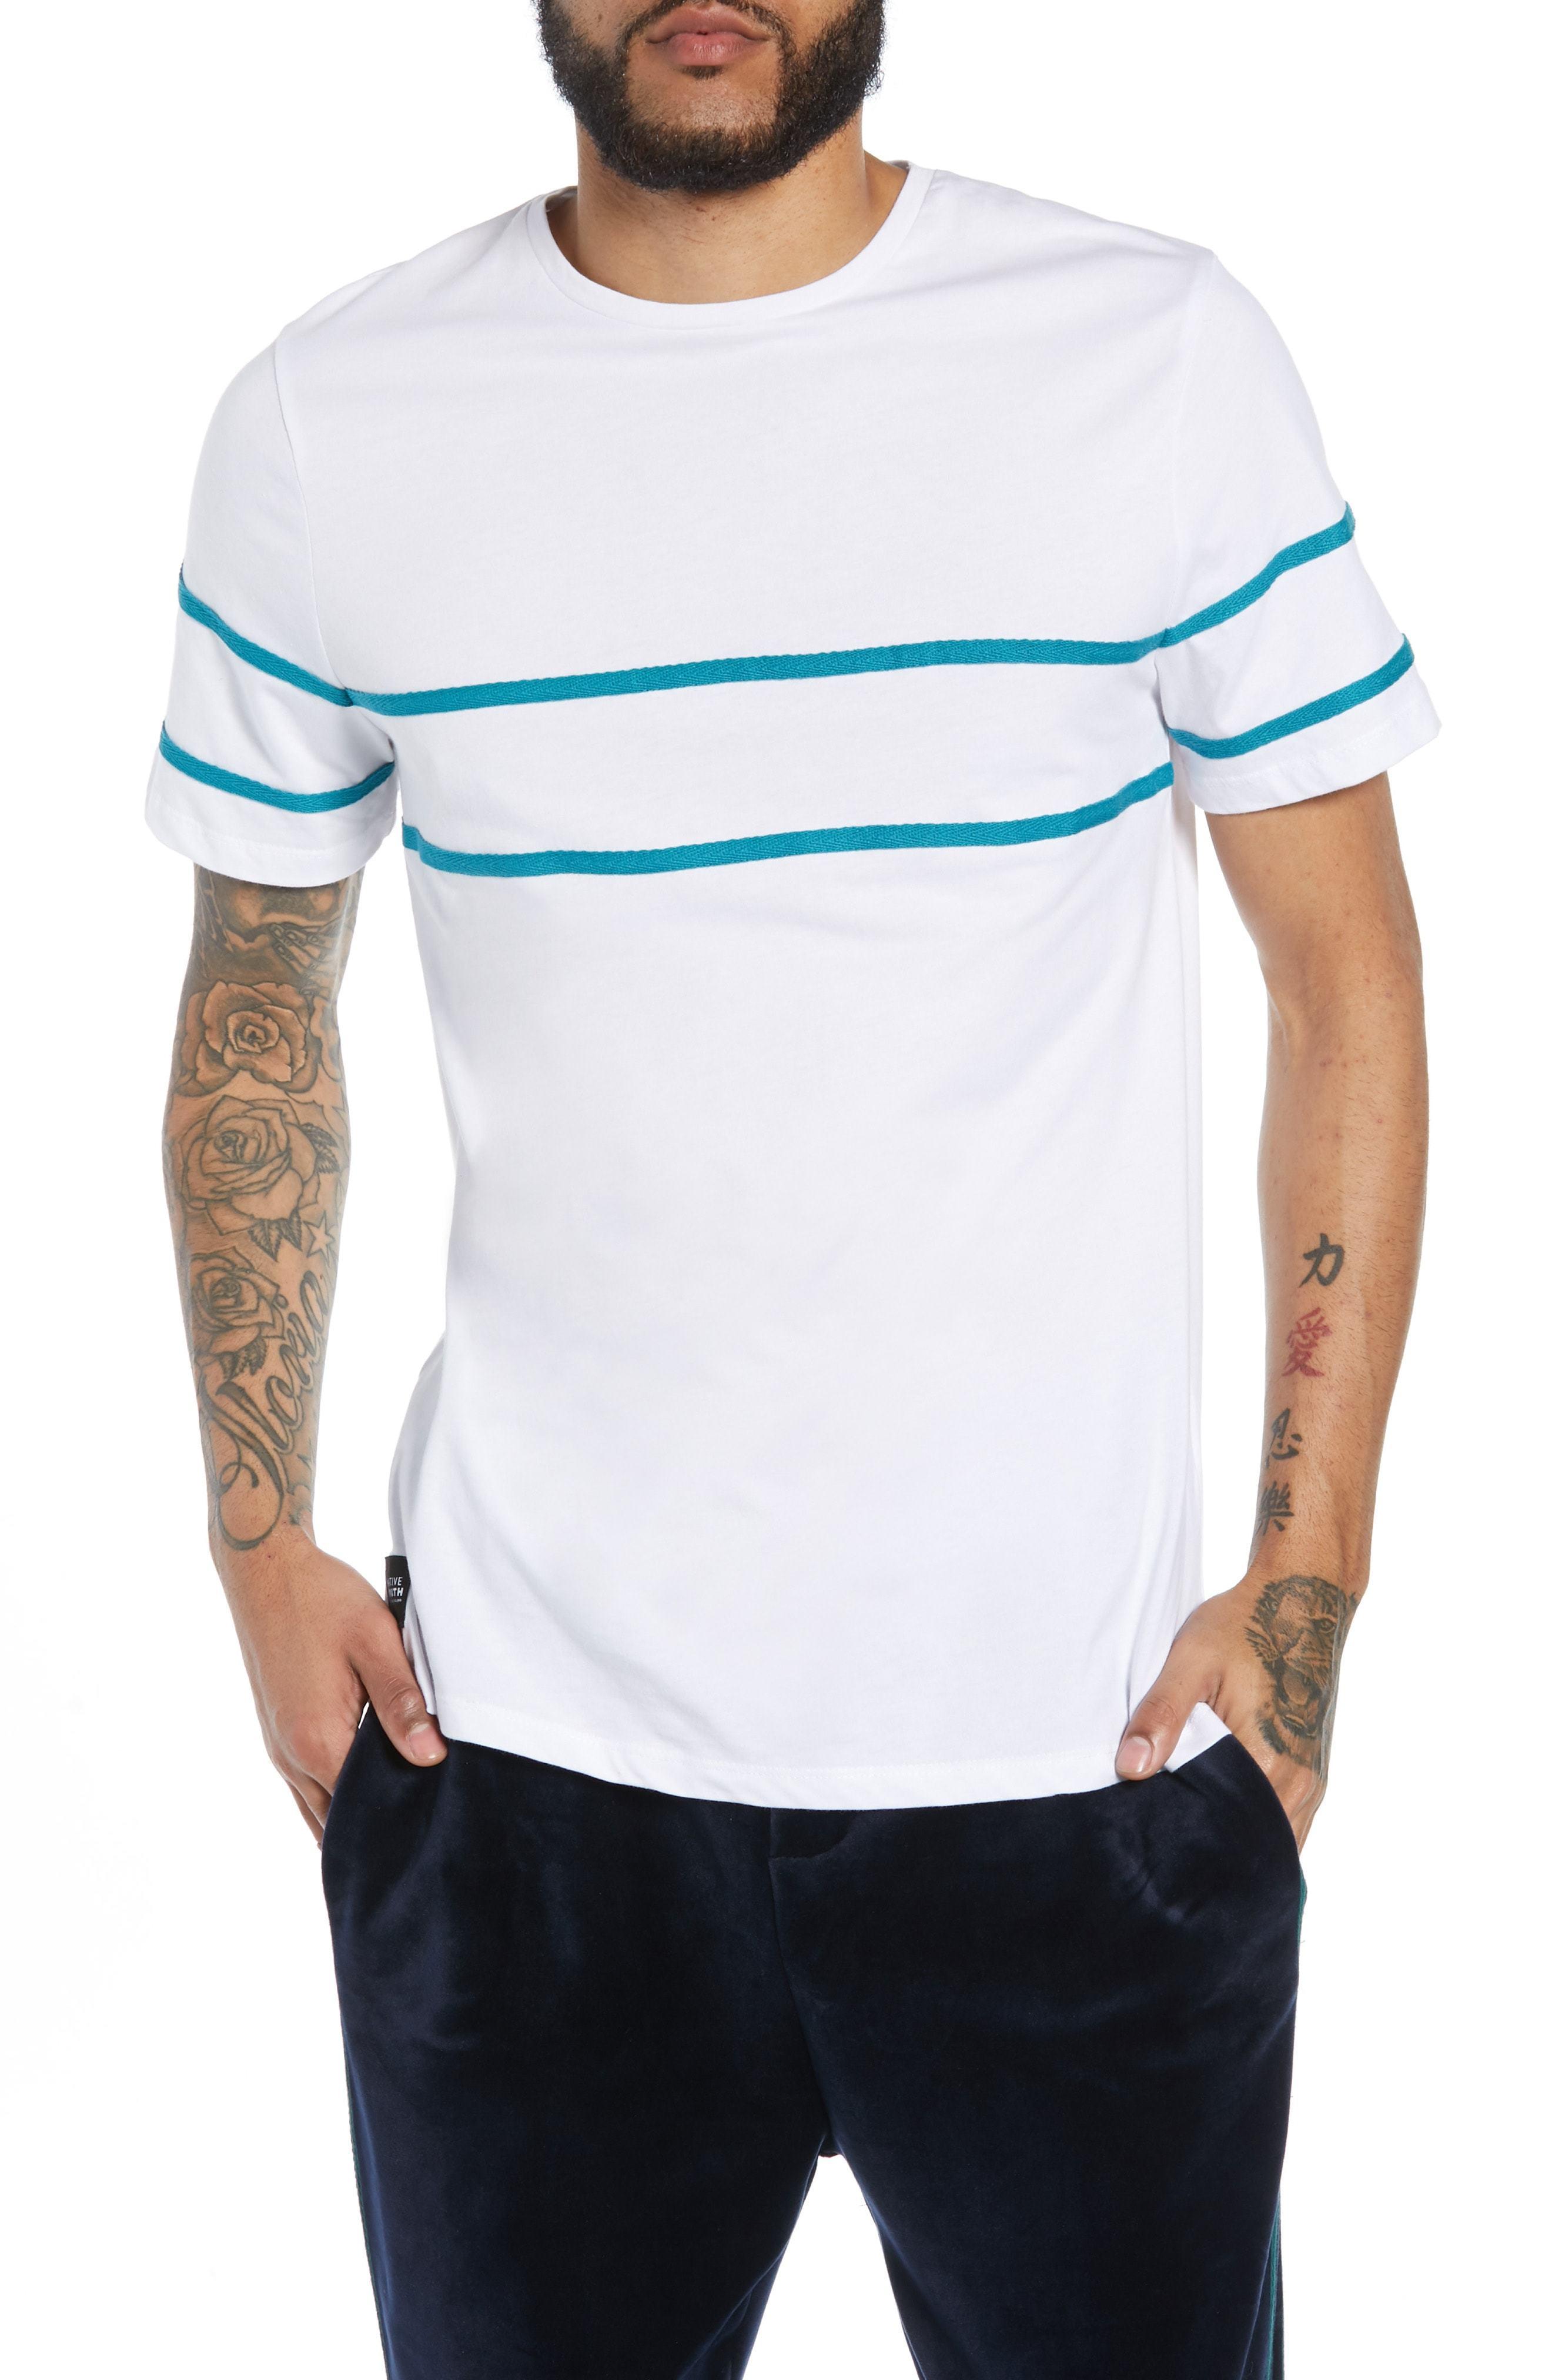 NATIVE YOUTH Herringbone Tape T Shirt